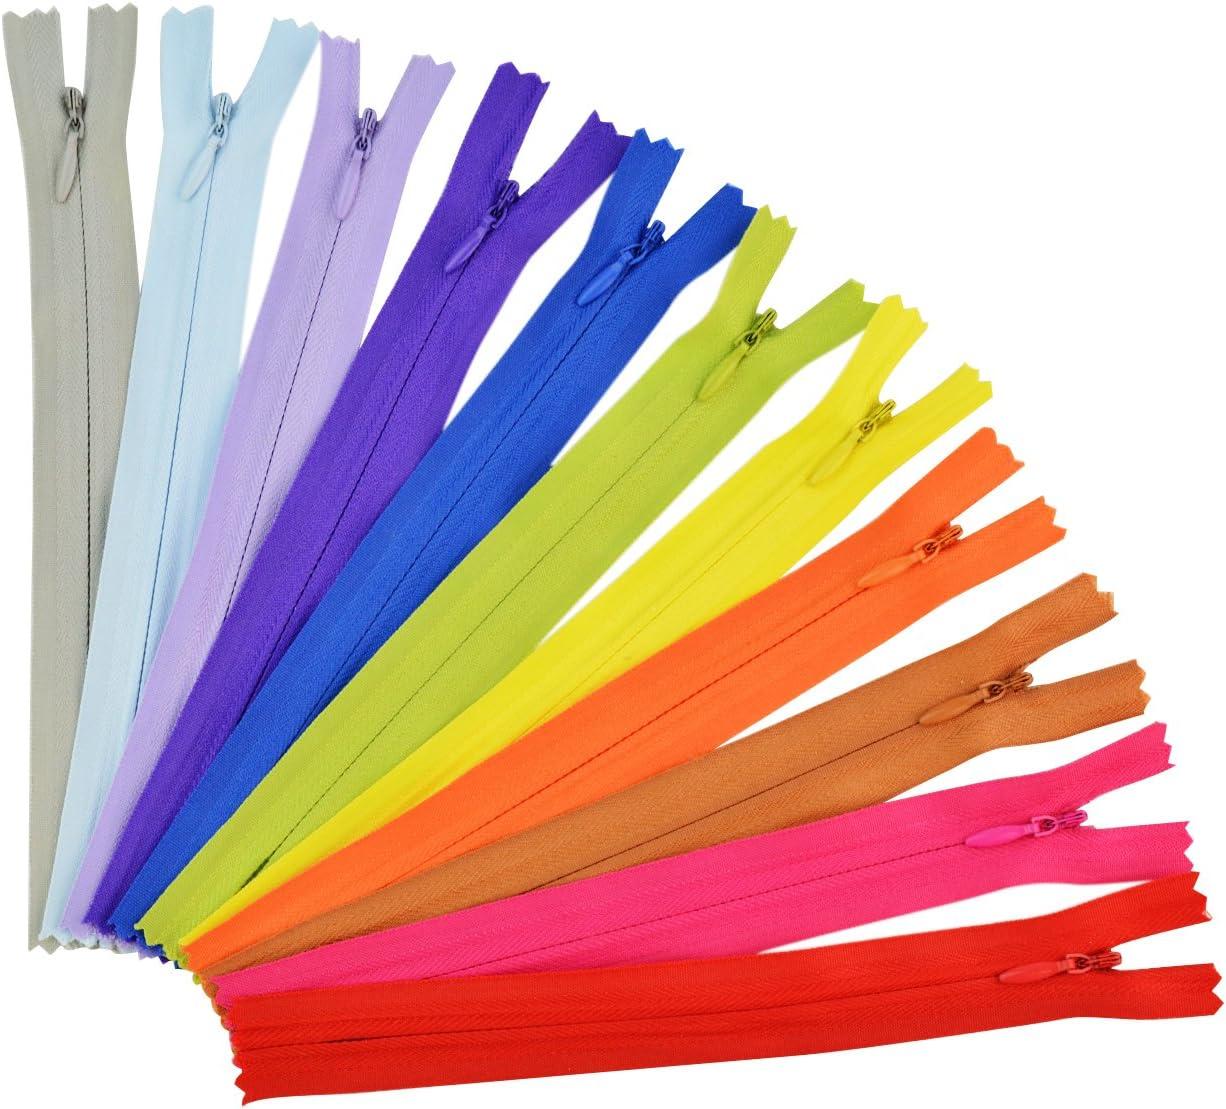 Jmkcoz 50pcs 7.8 Inch Sewing Invisible Max 41% OFF Nylon Finally popular brand Zippers Ta